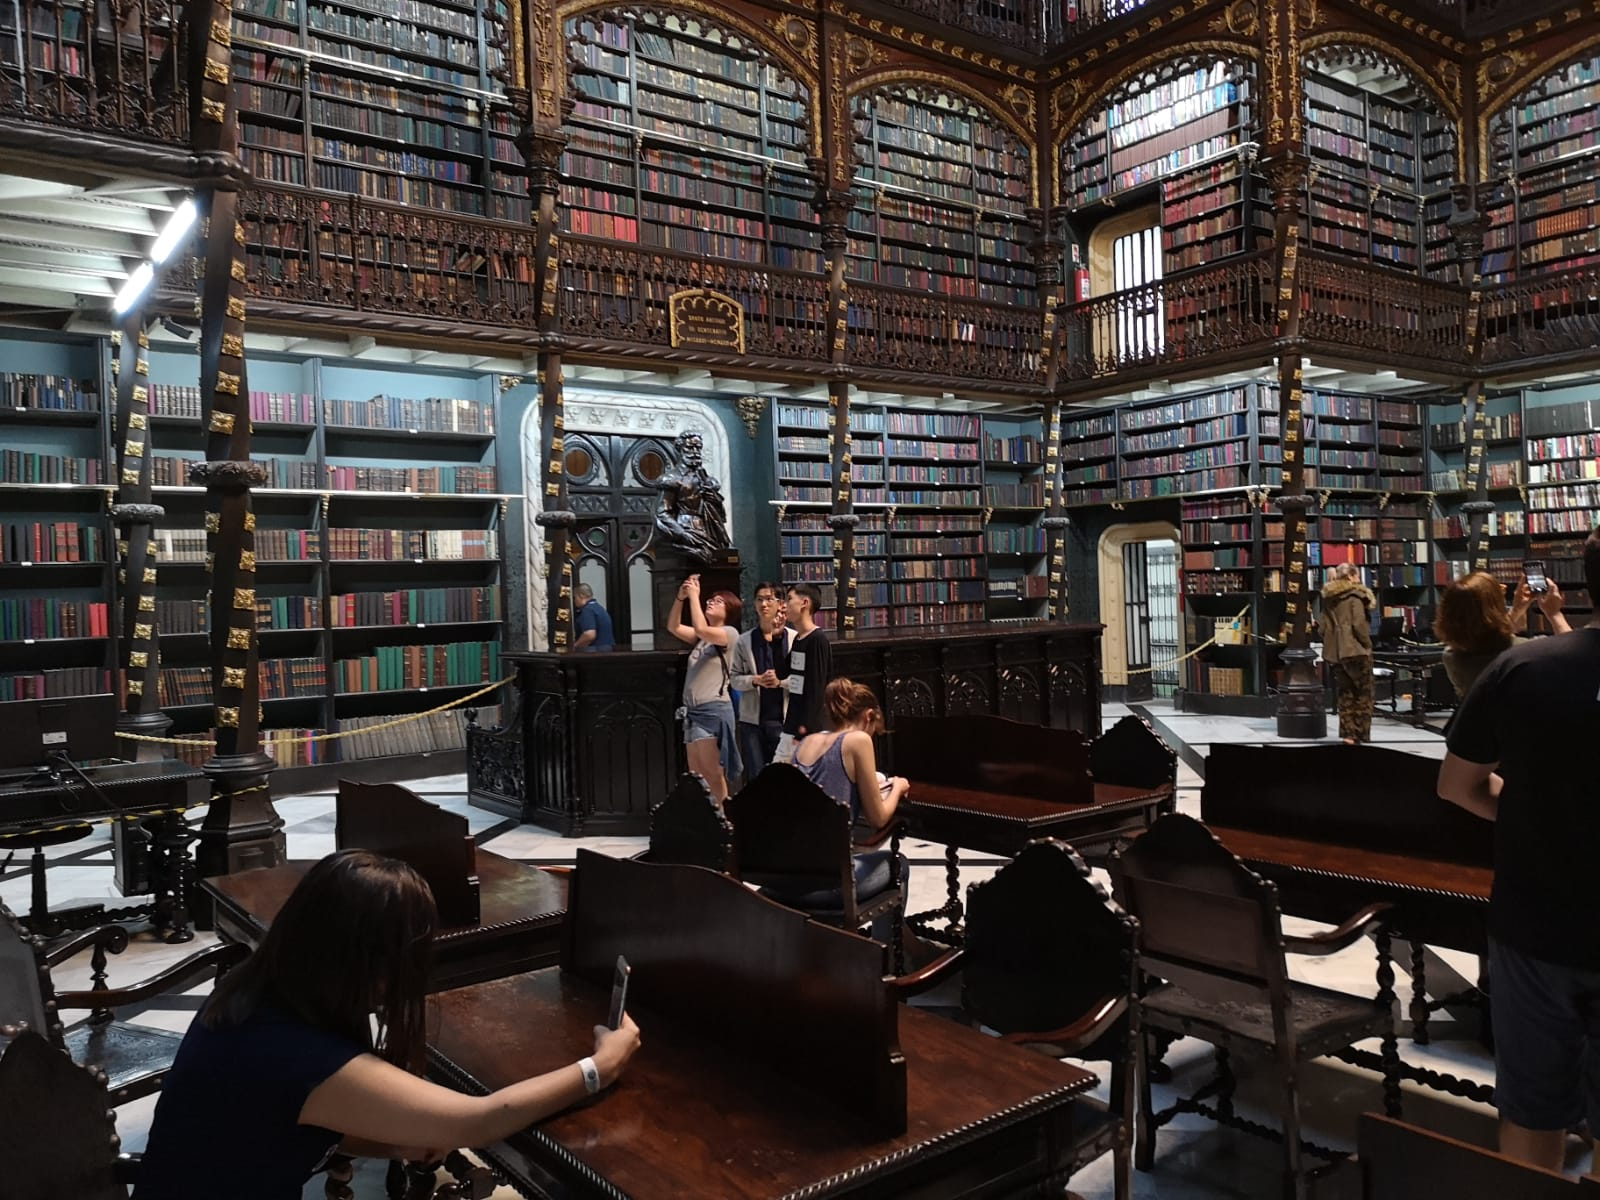 76 bibliothèque